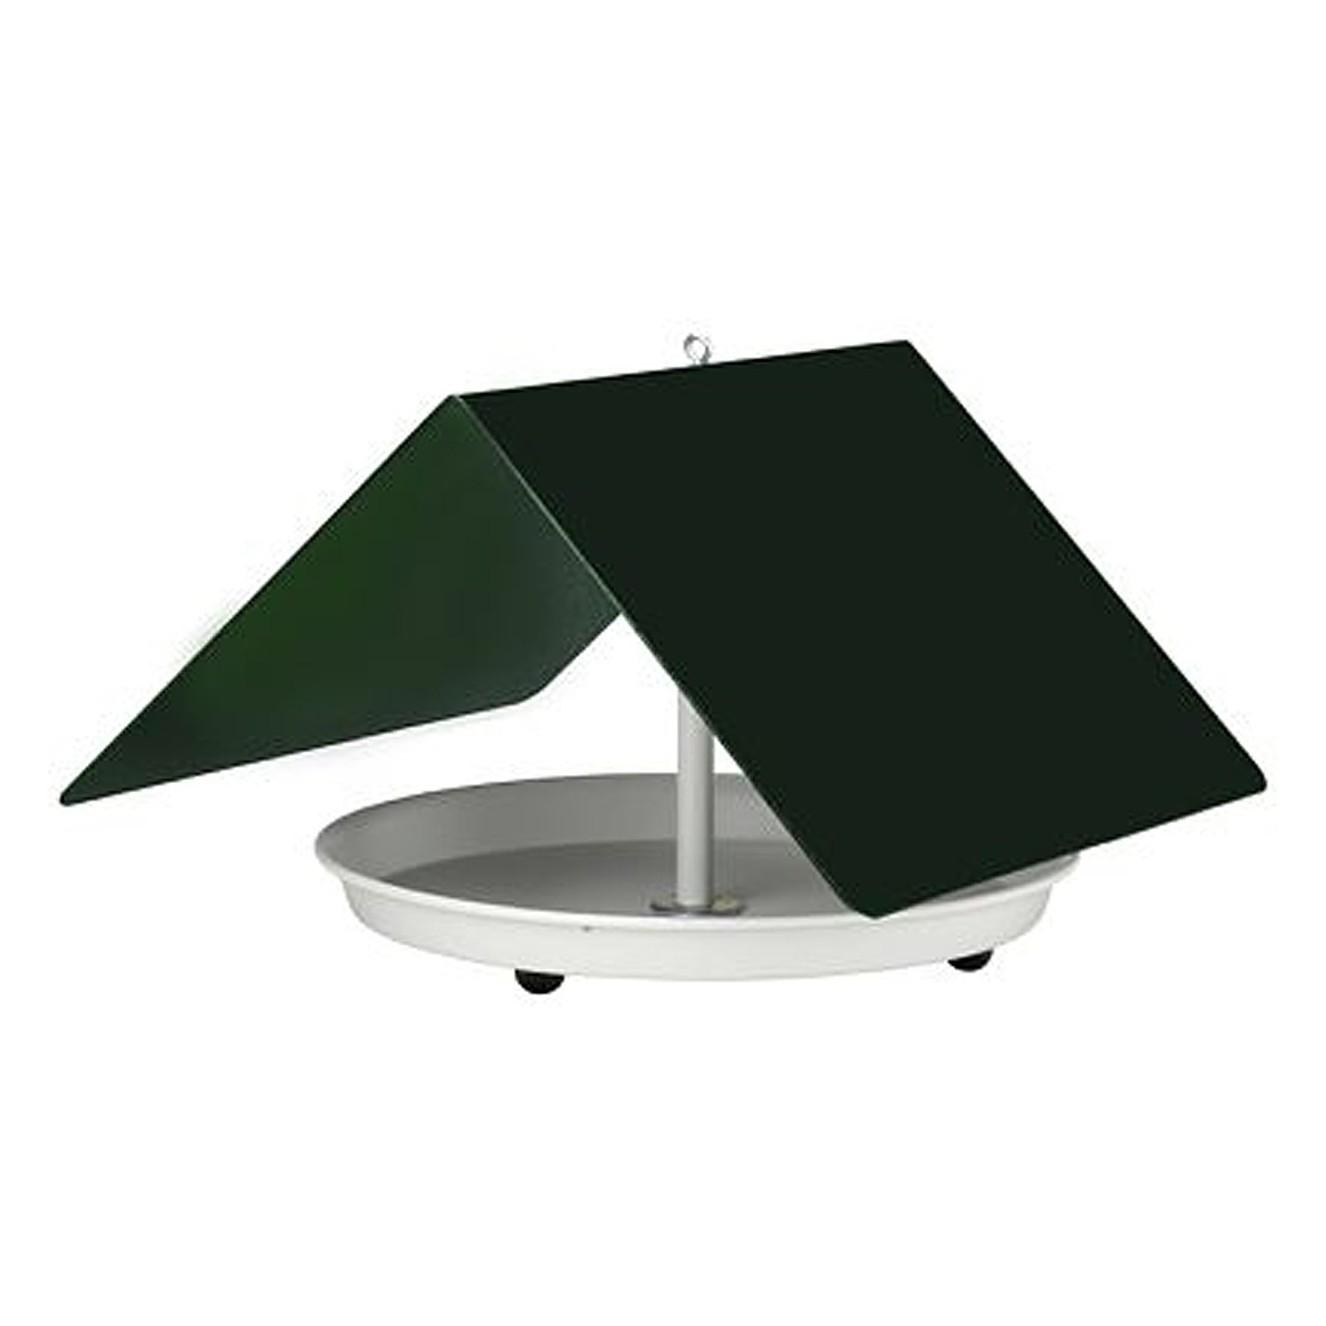 Vogelhaus Birdy - Aluminium - Grün, Flora